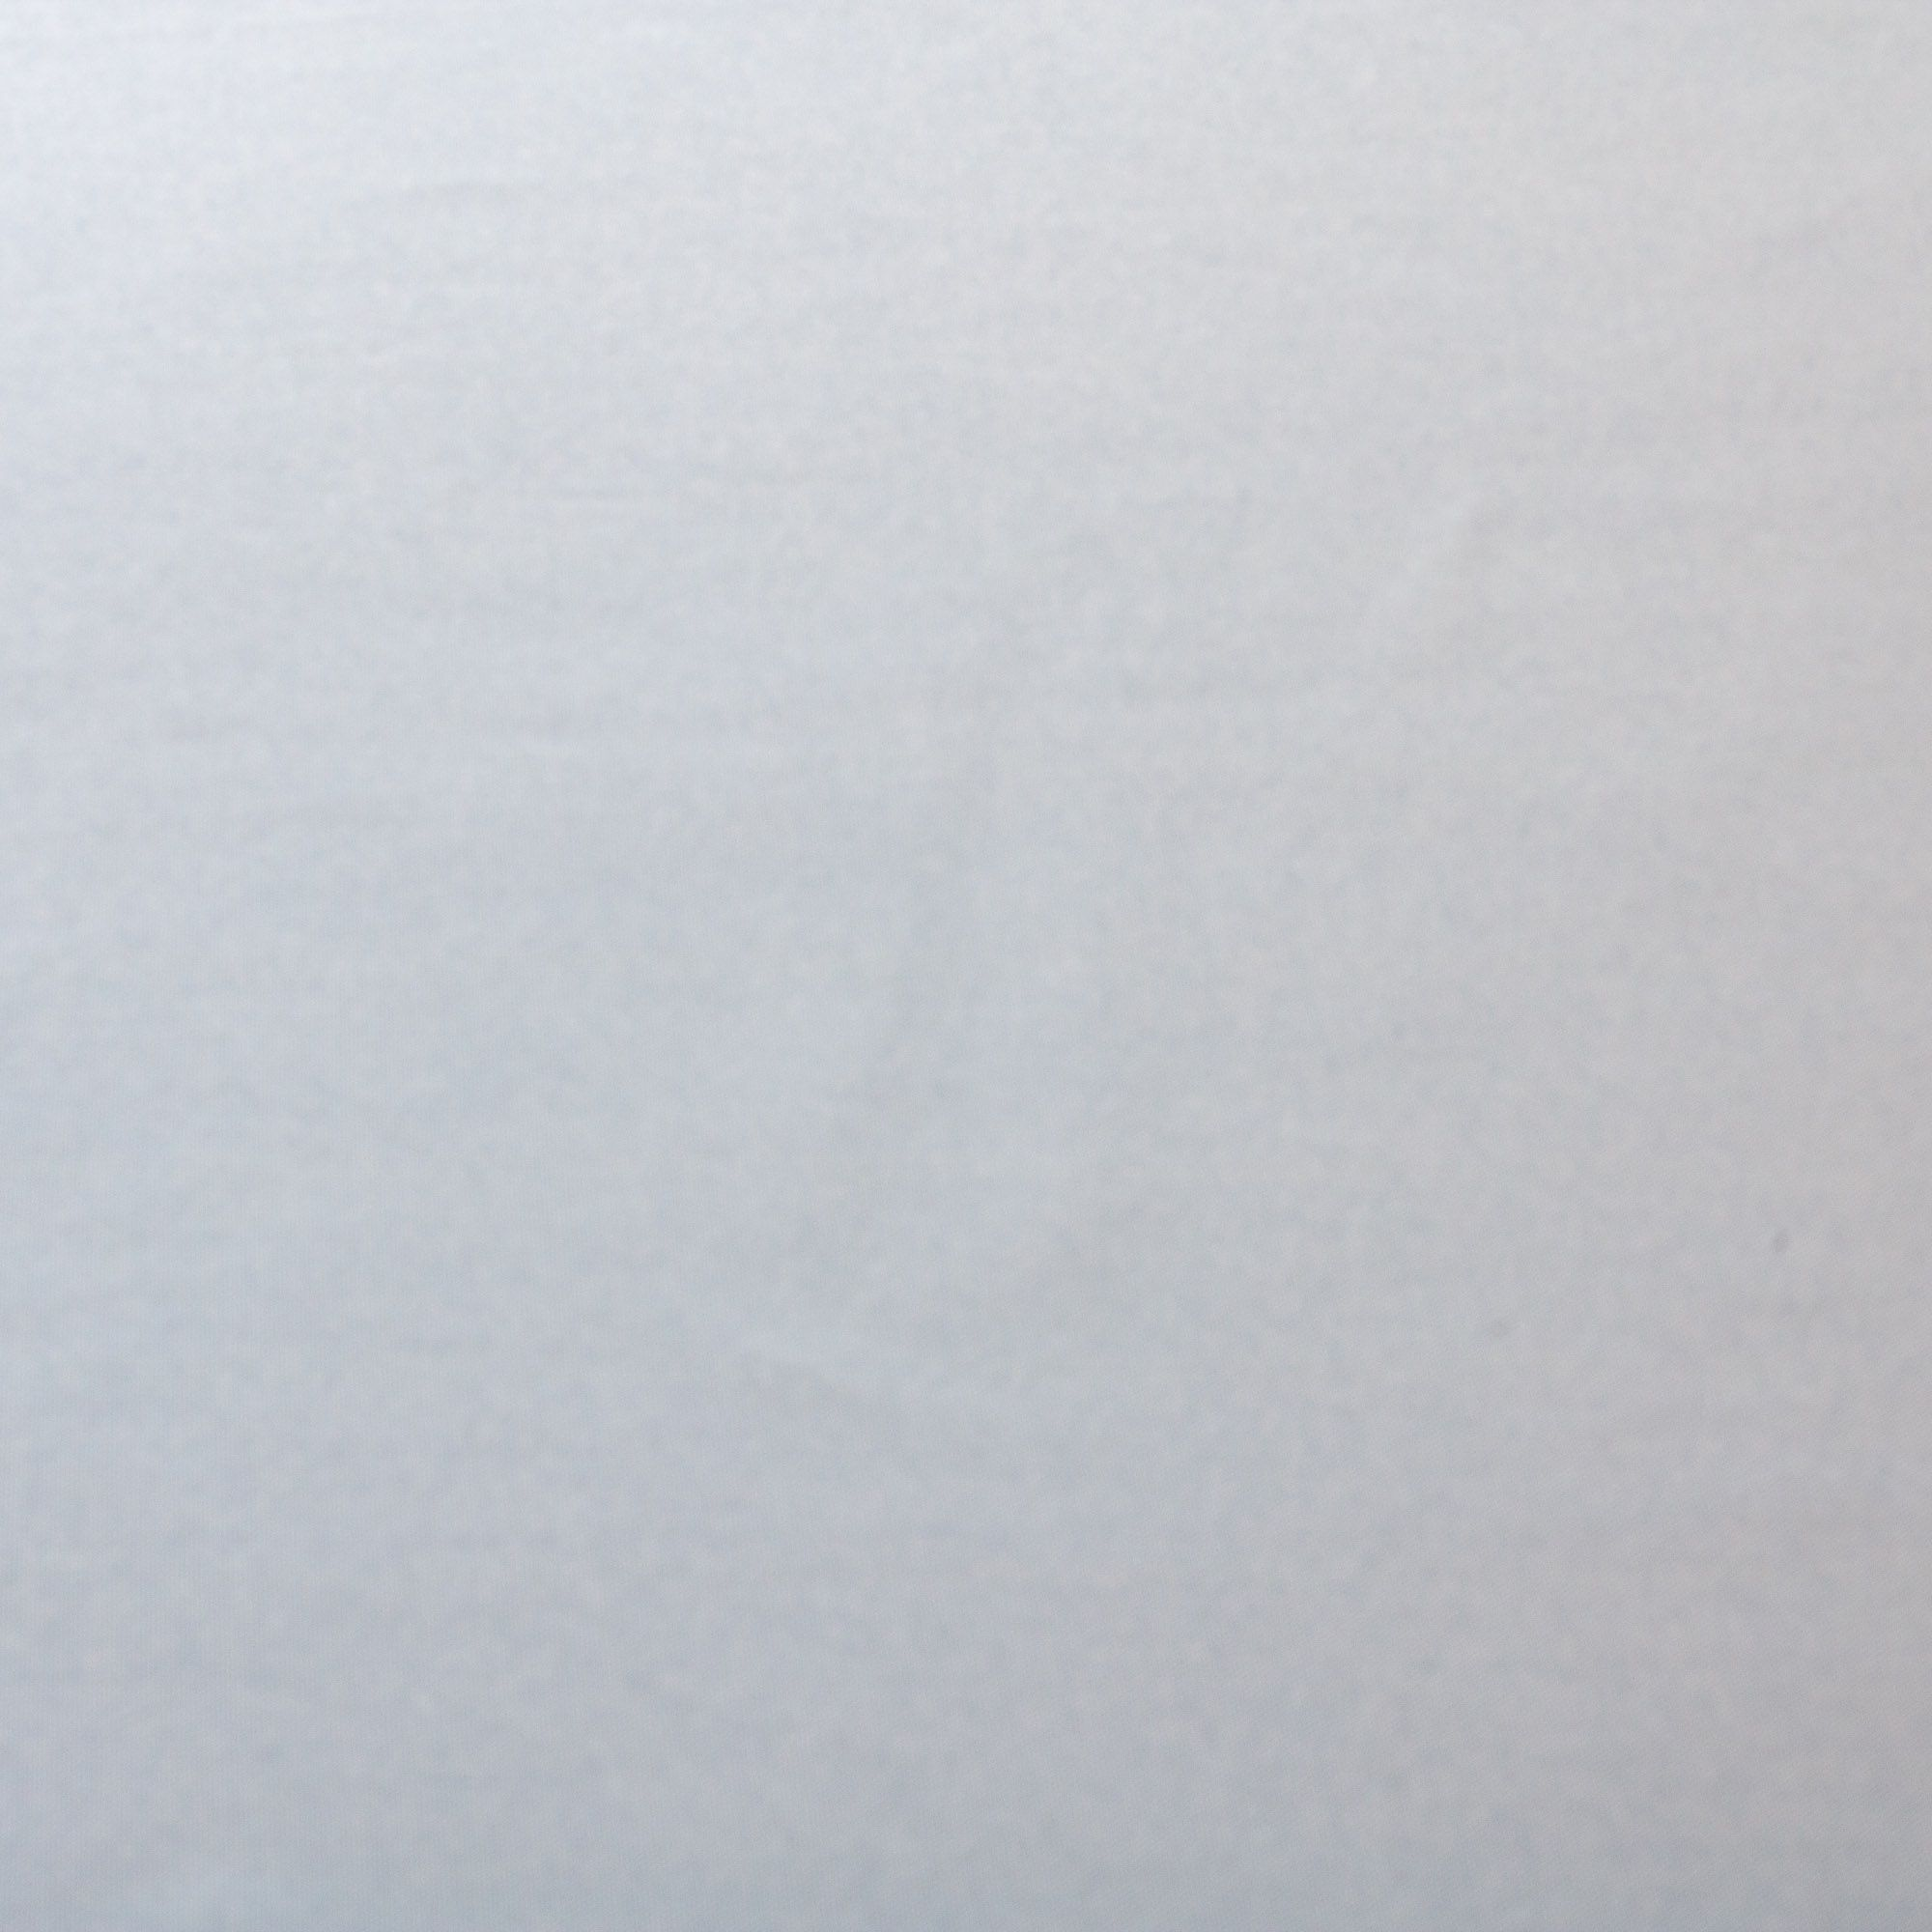 Tecido Oxford Azul Claro 100% Poliester 1,50 m Largura